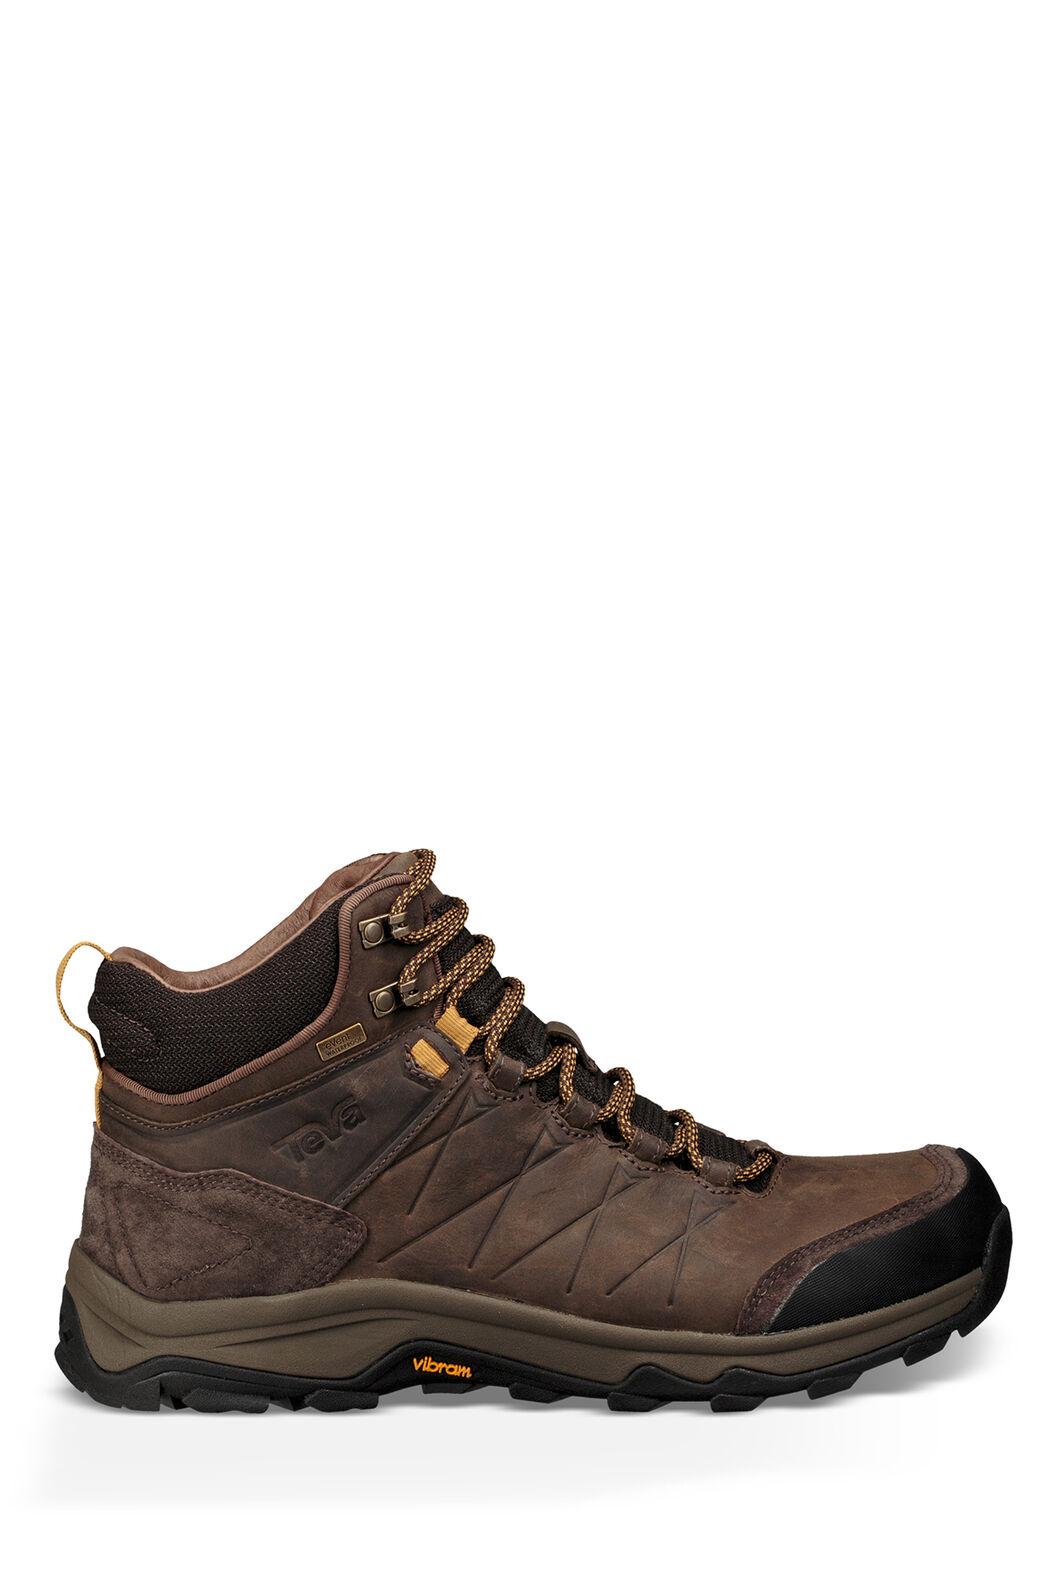 Teva Arrowood  Riva WP Hiking Boots — Men's, Turkish Coffee, hi-res